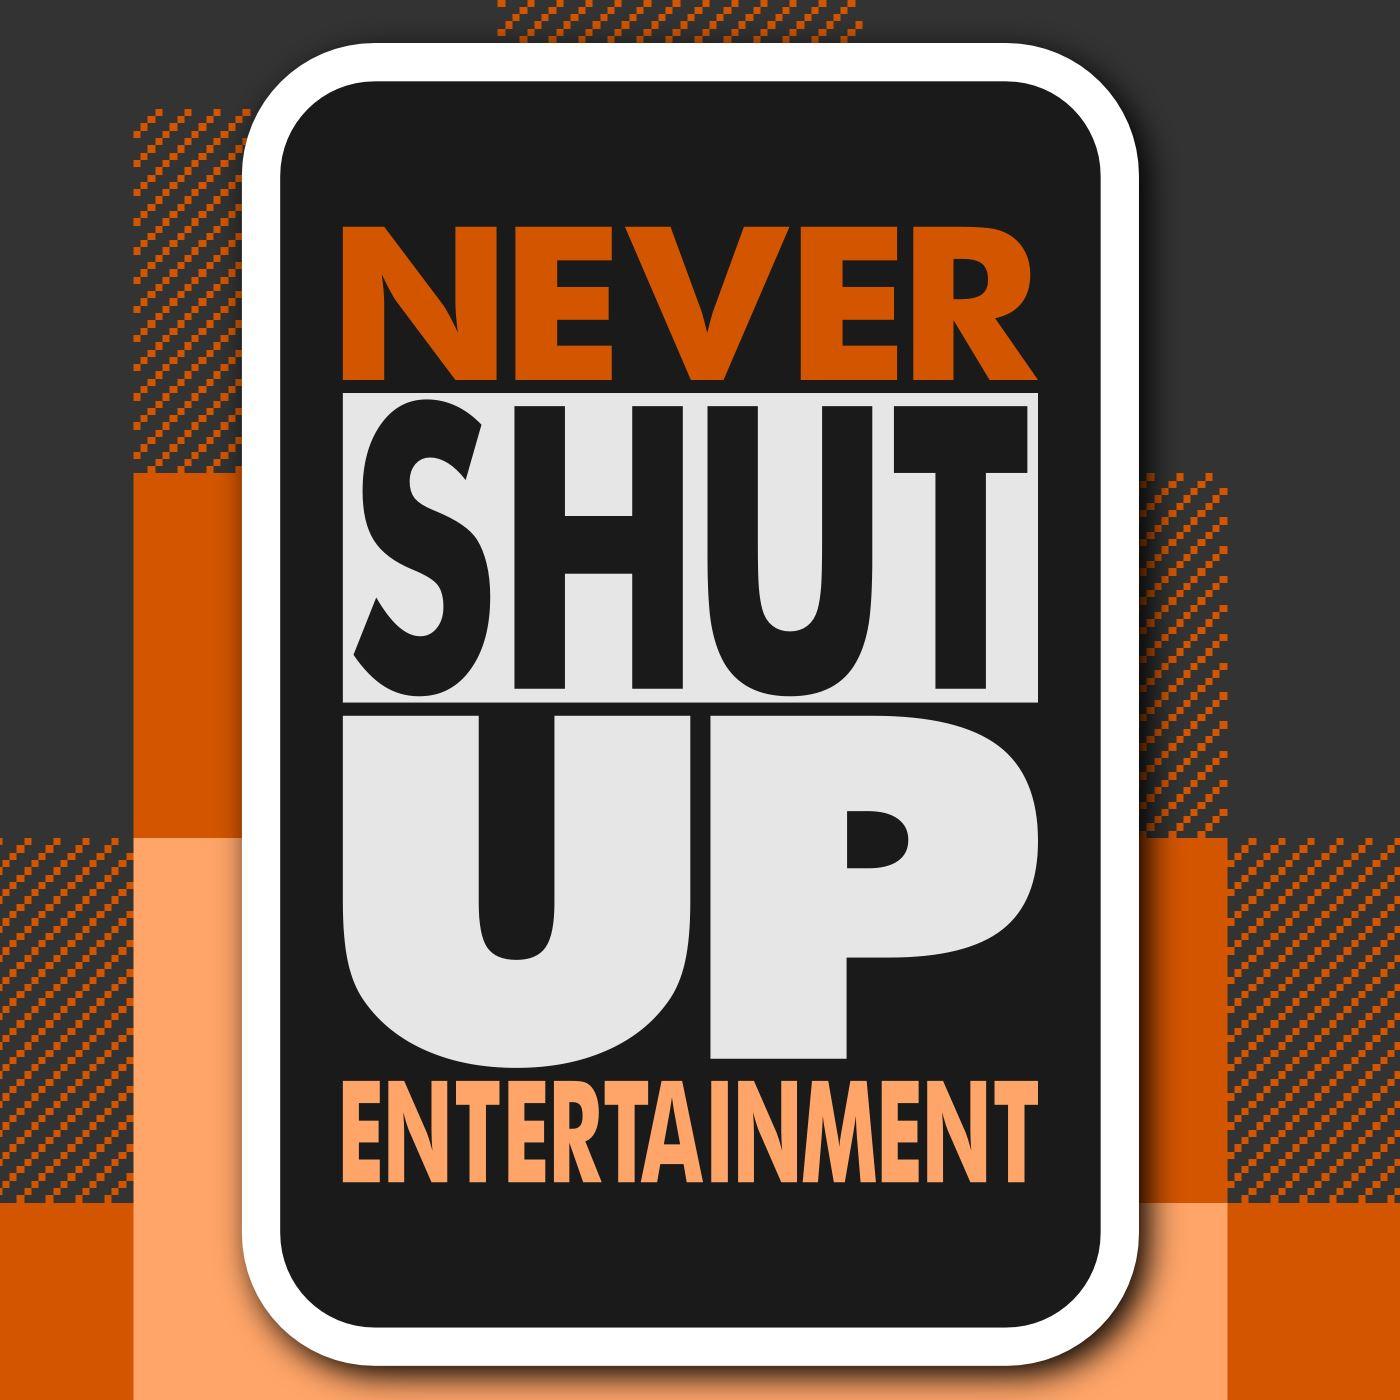 Never Shut Up Entertainment